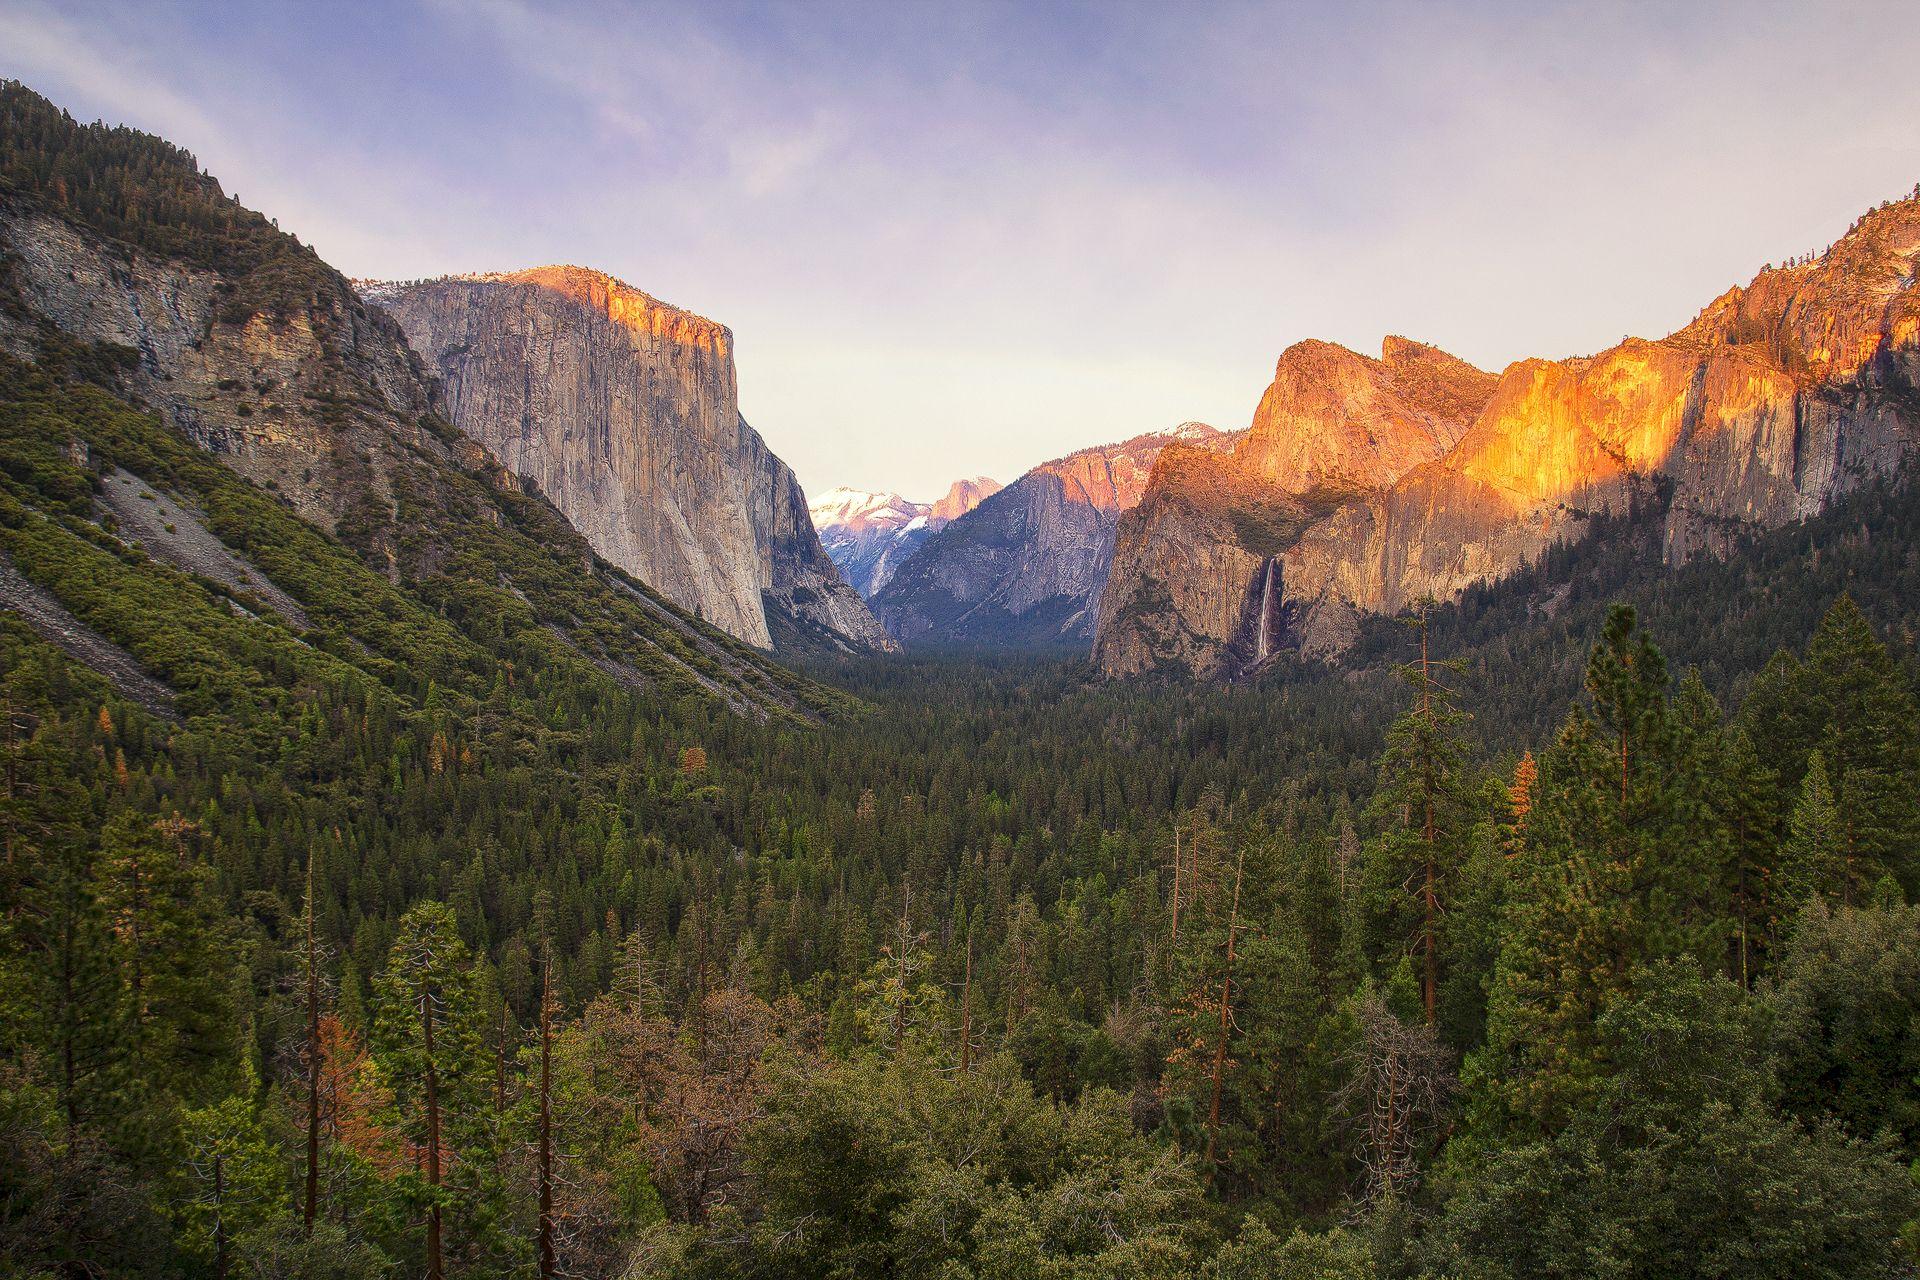 scenic, Tunnel View, El Capitan, Half Dome, Bridalveil Fall, Yosemite National Park, State Route 41, Wawona Tunnel, California, USA